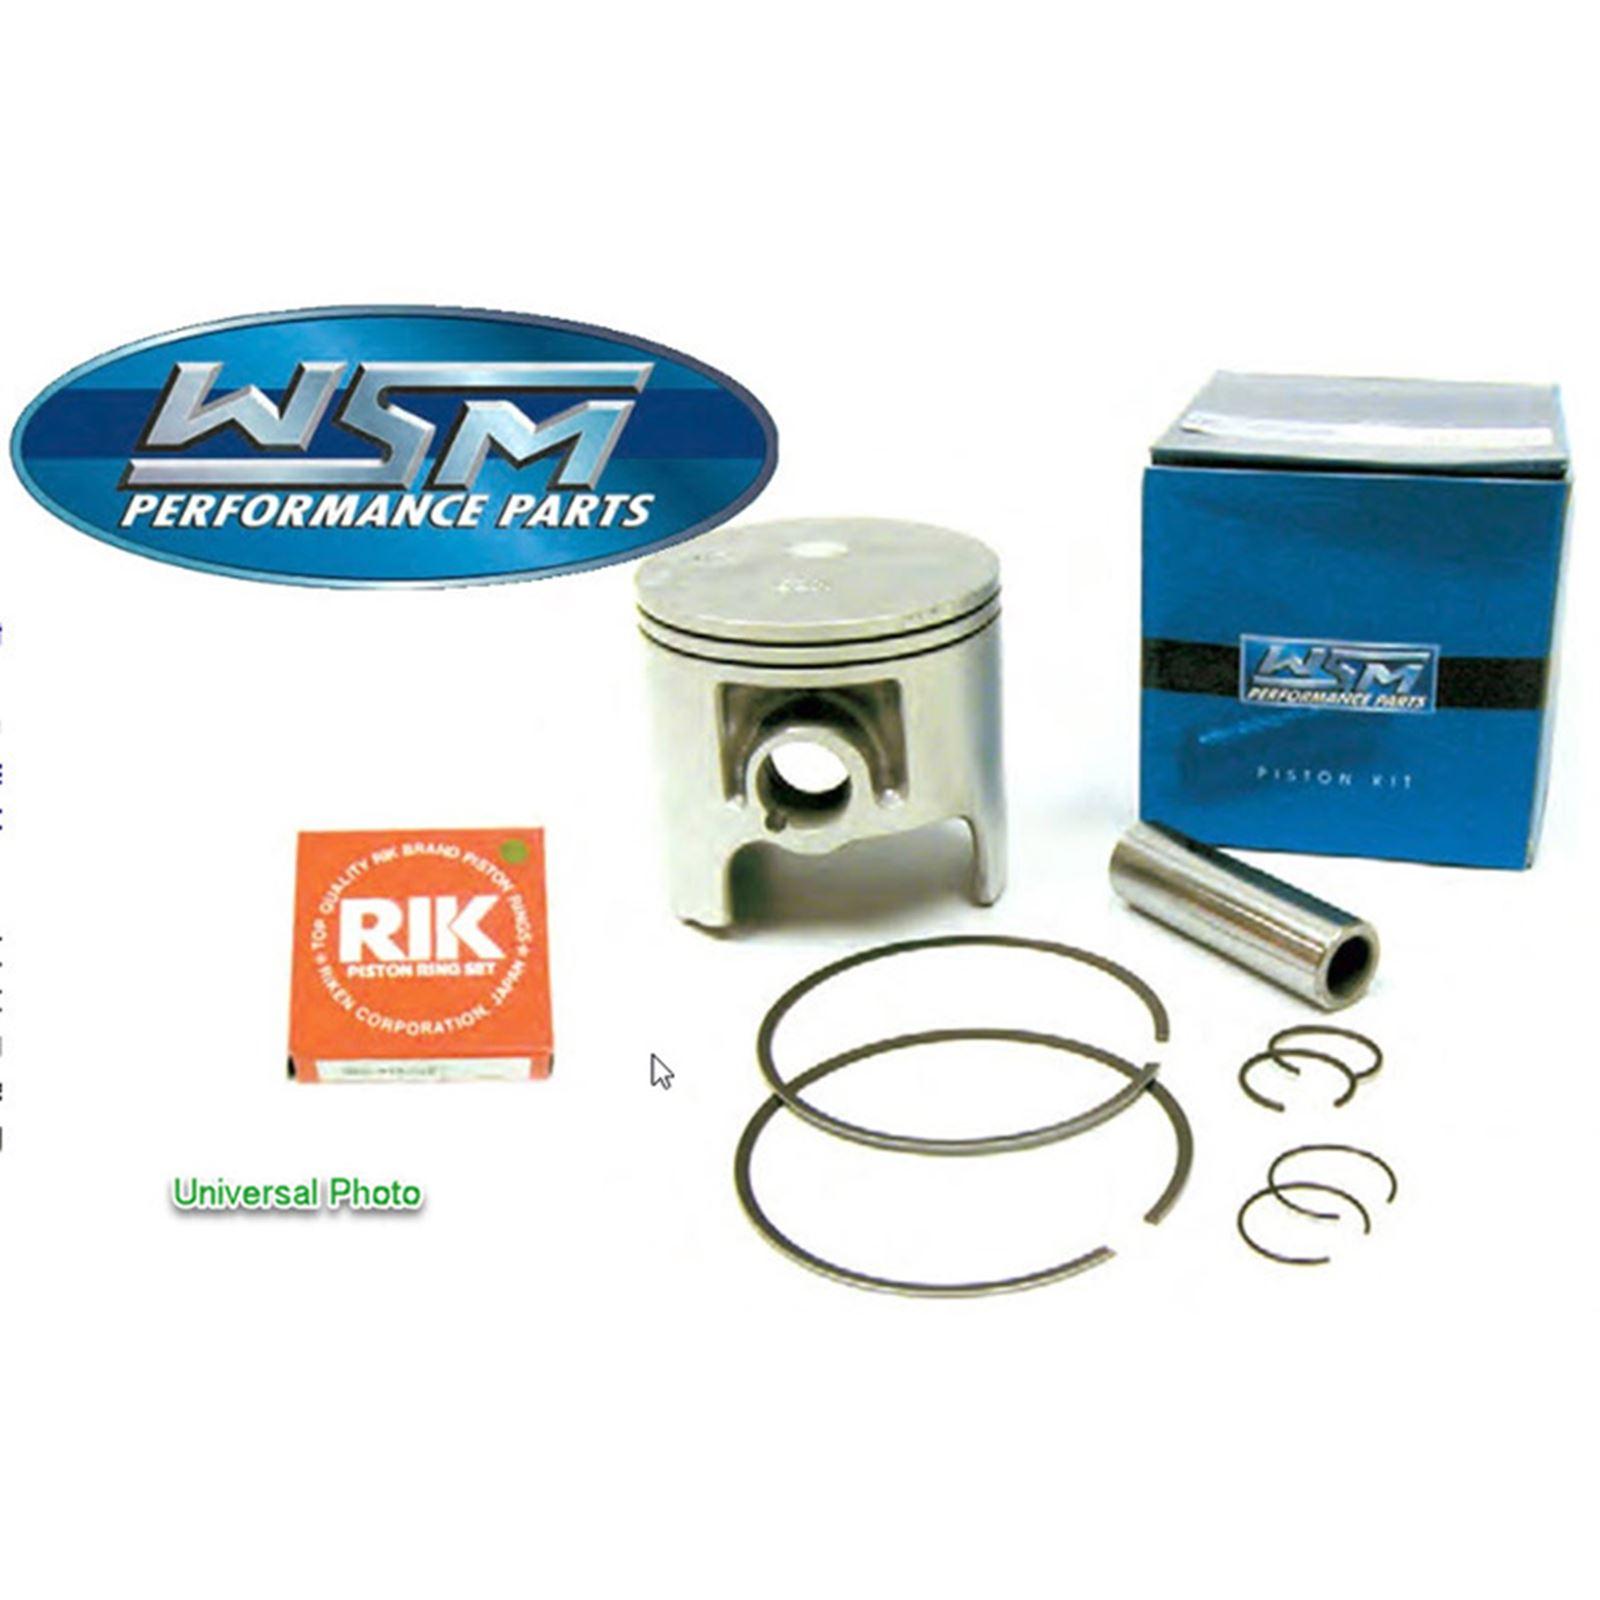 WSM Piston Kit - Kawasaki - Standard